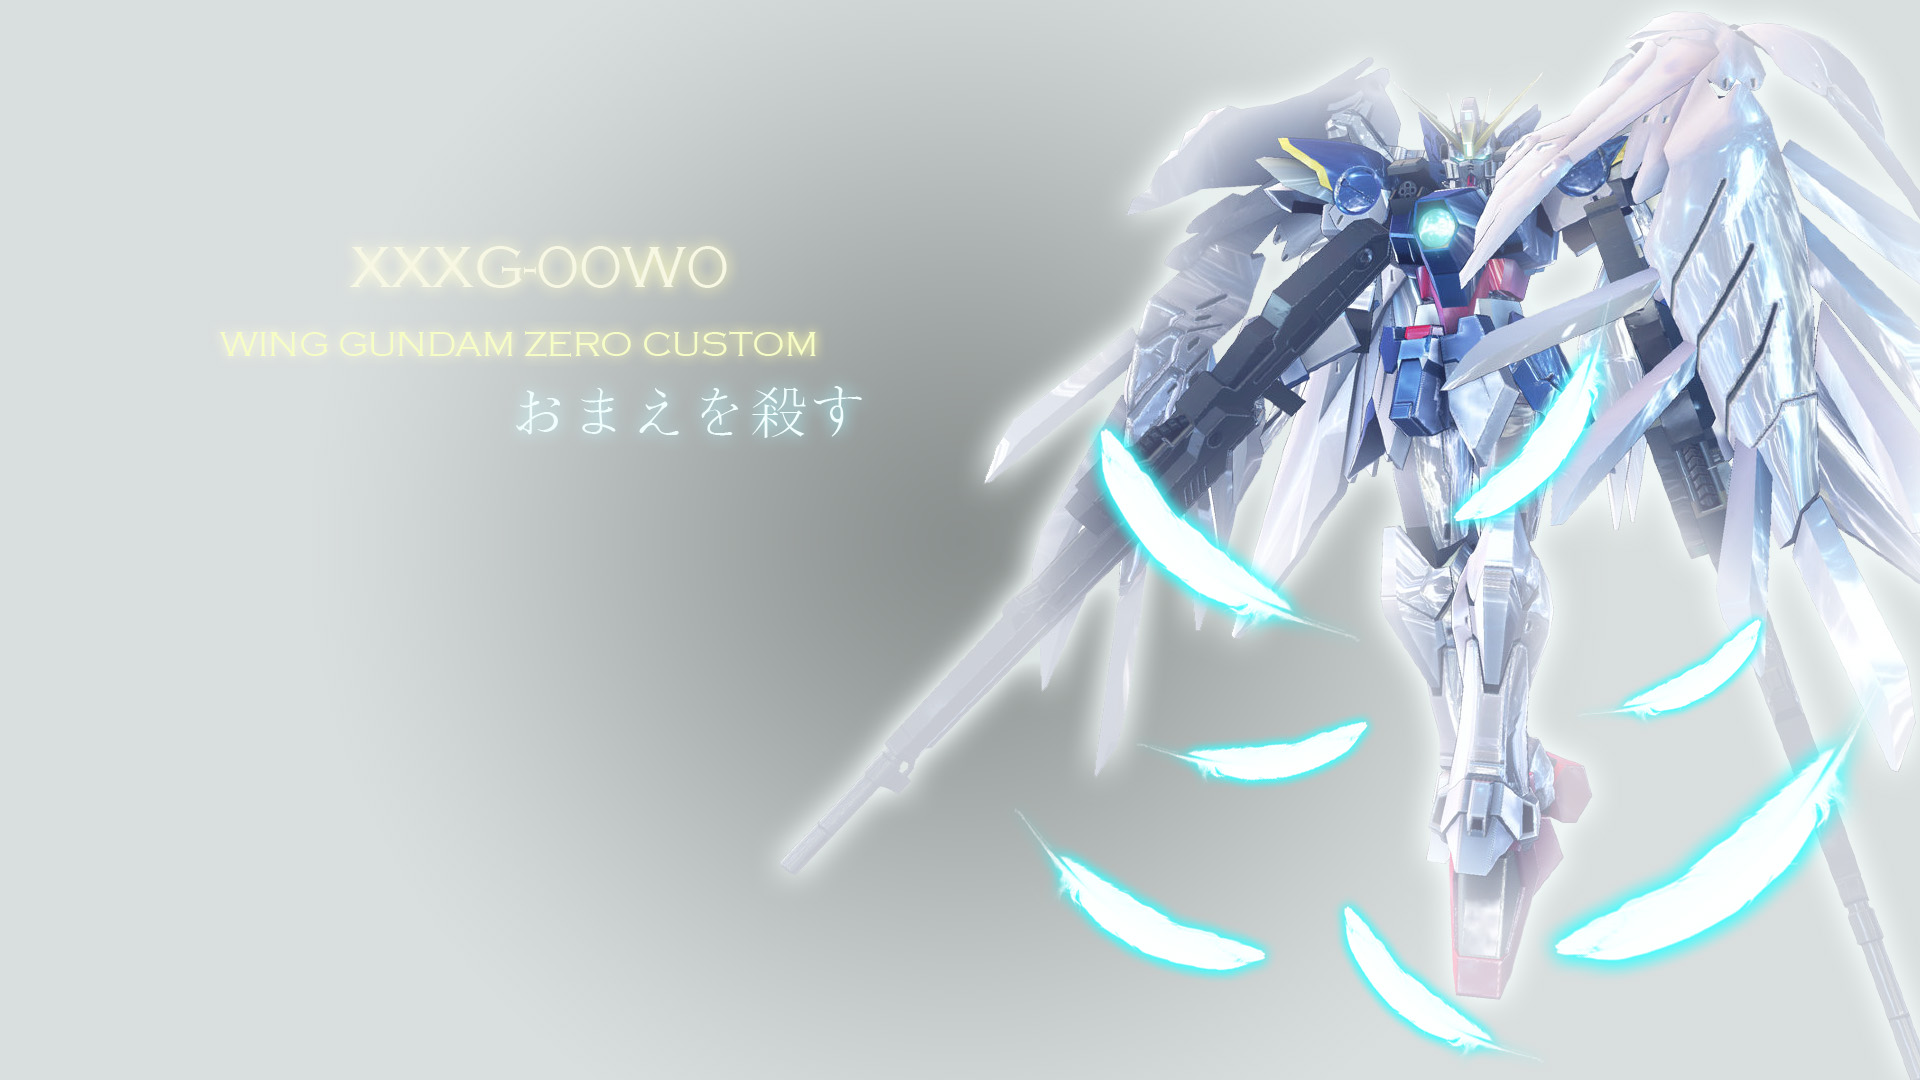 Gundam Wing Wallpaper HD on MarkInternationalinfo 1920x1080